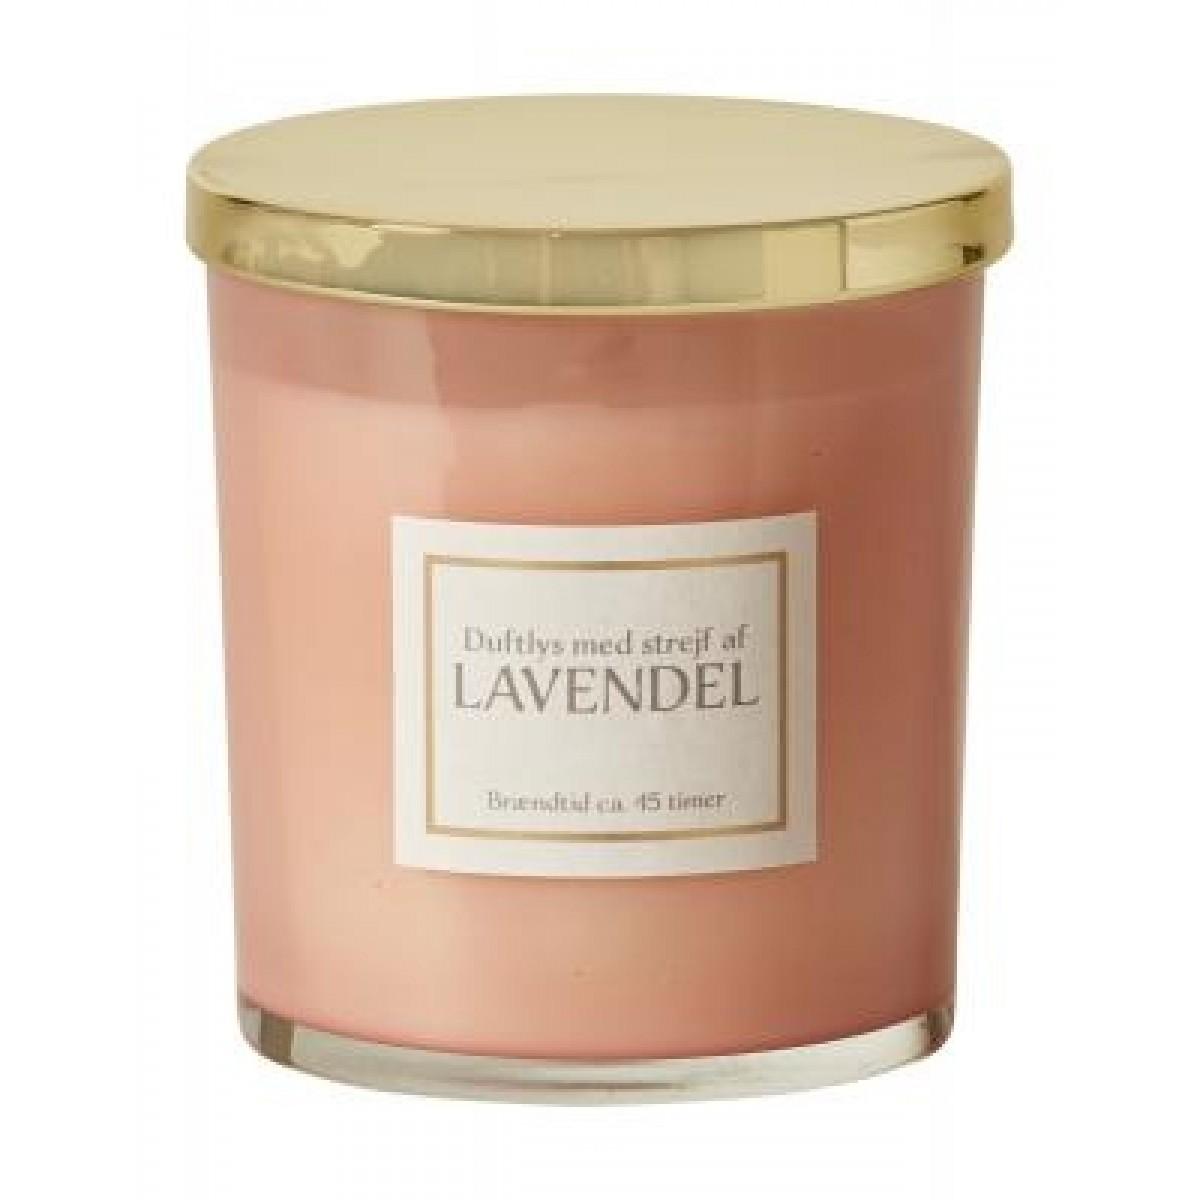 DACORE Duftlys i rosa glas - lavendel